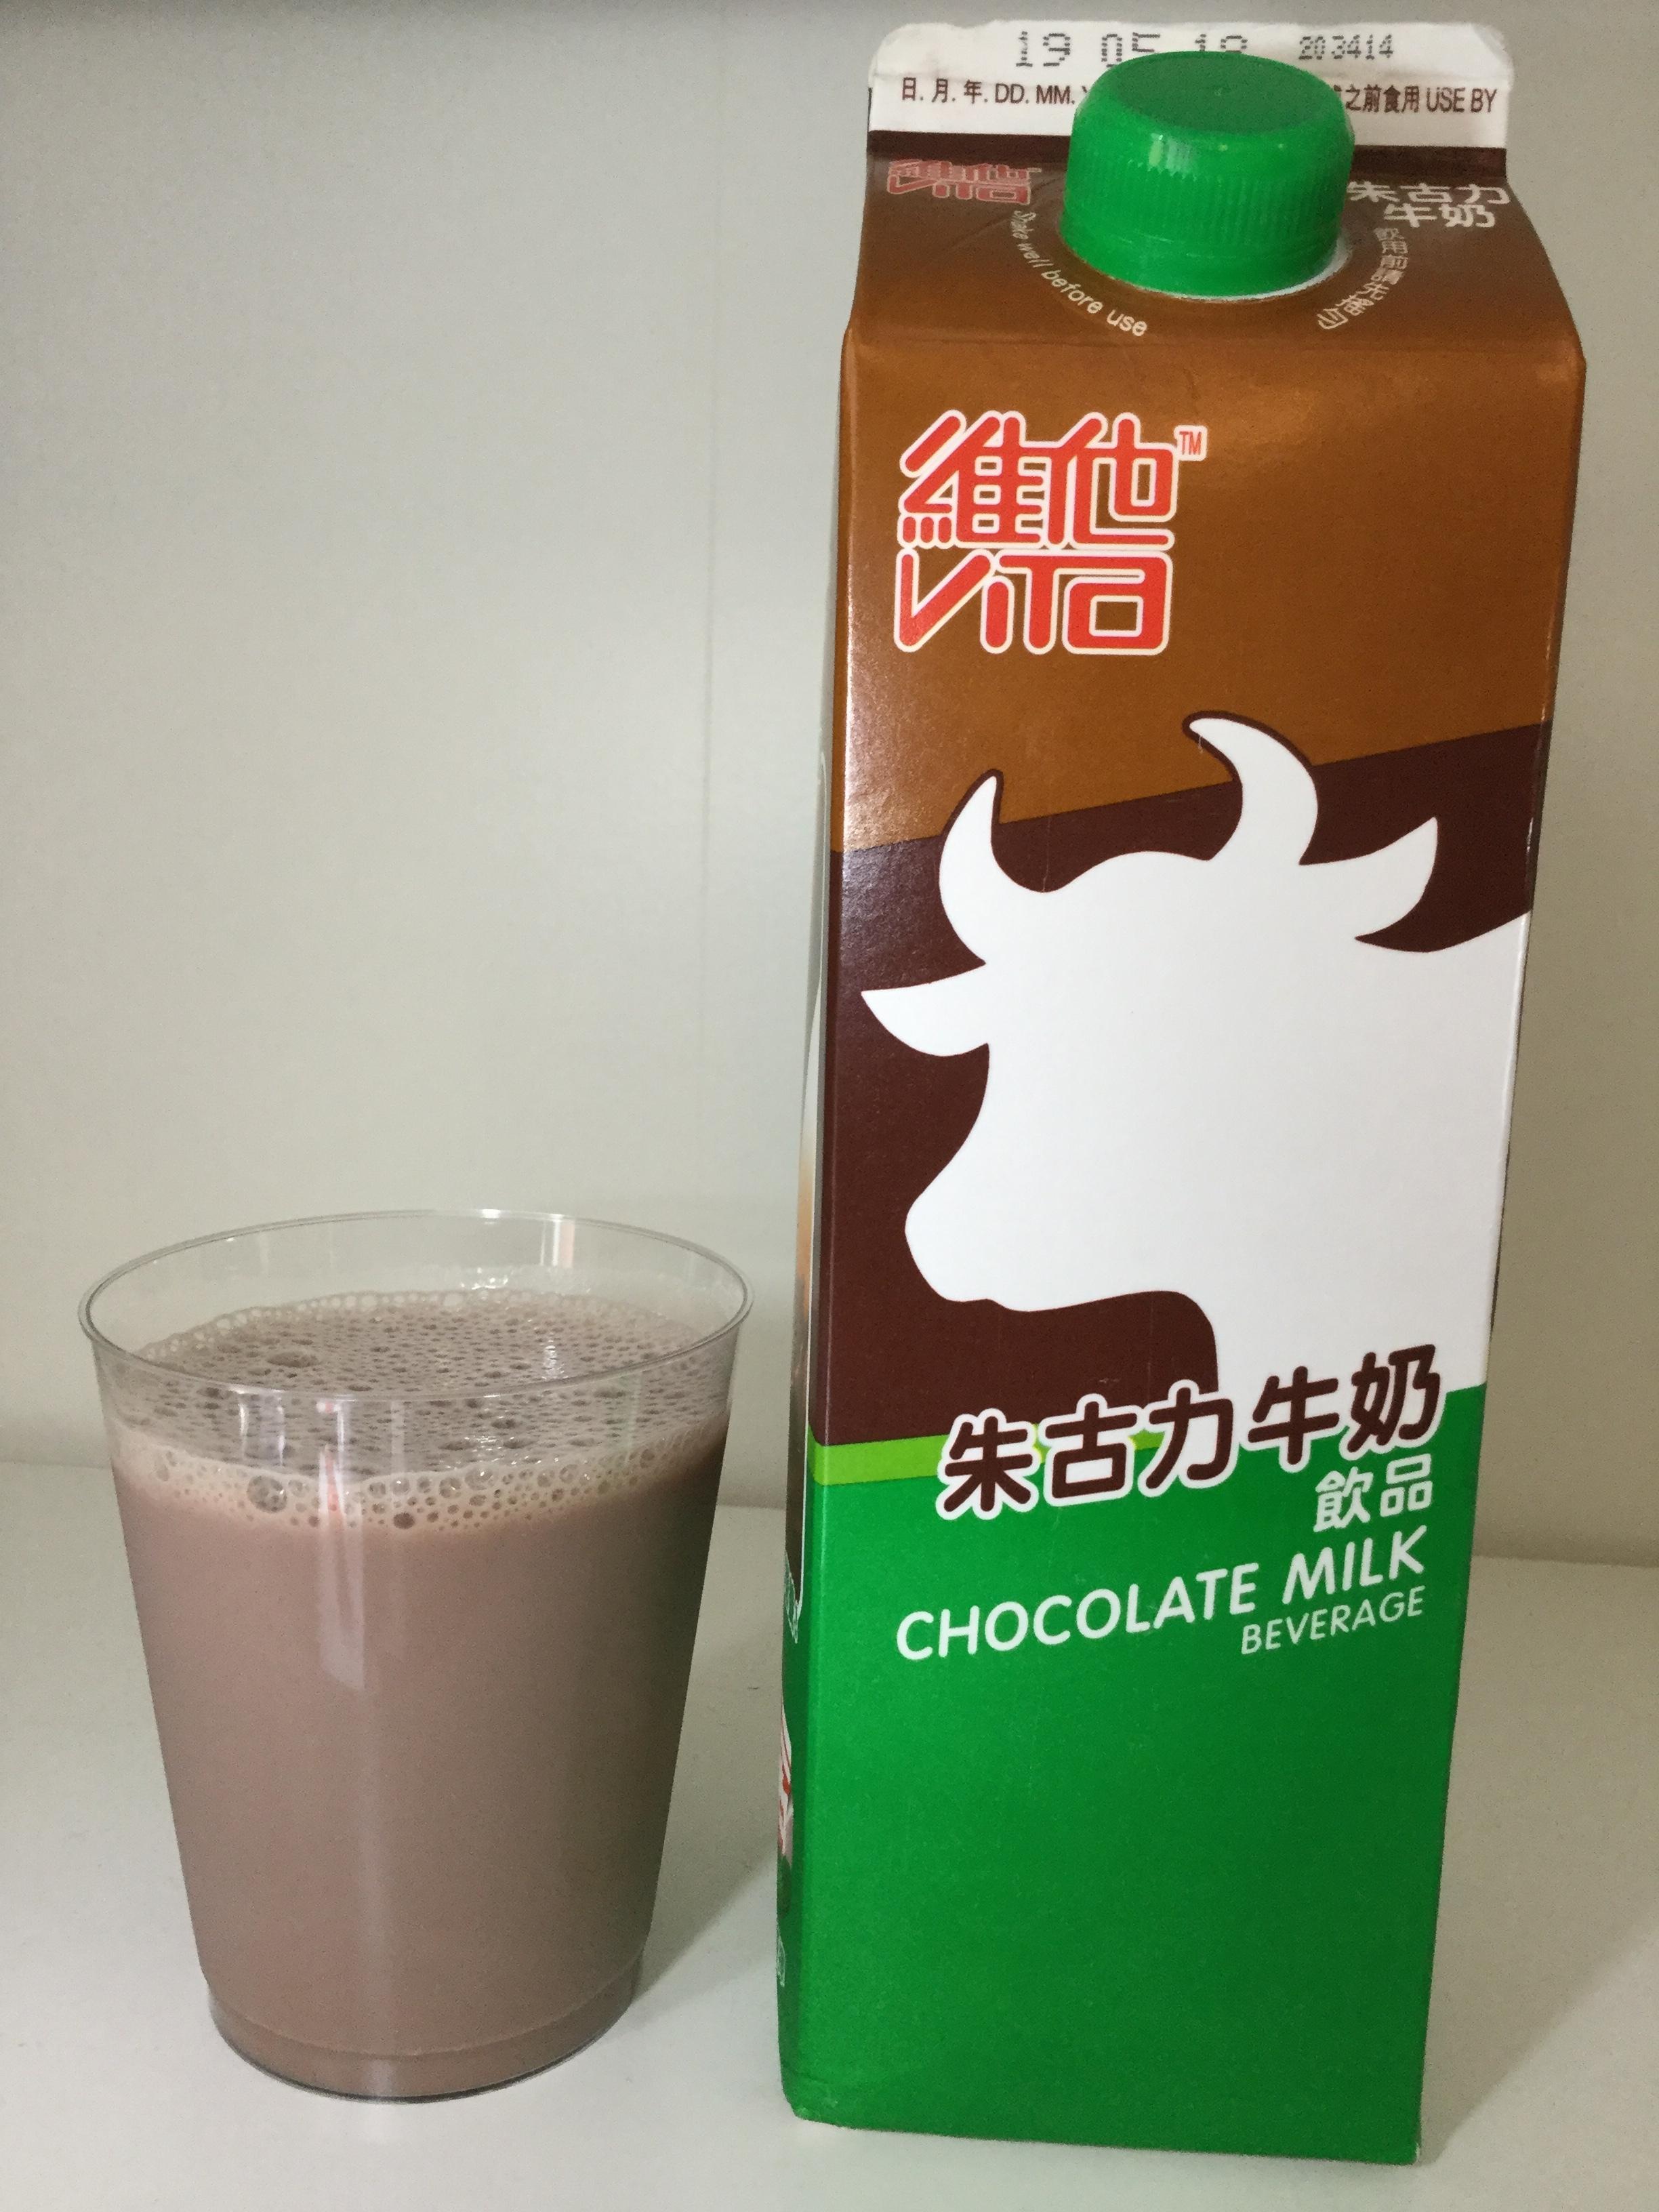 Vita Chocolate Milk Cup